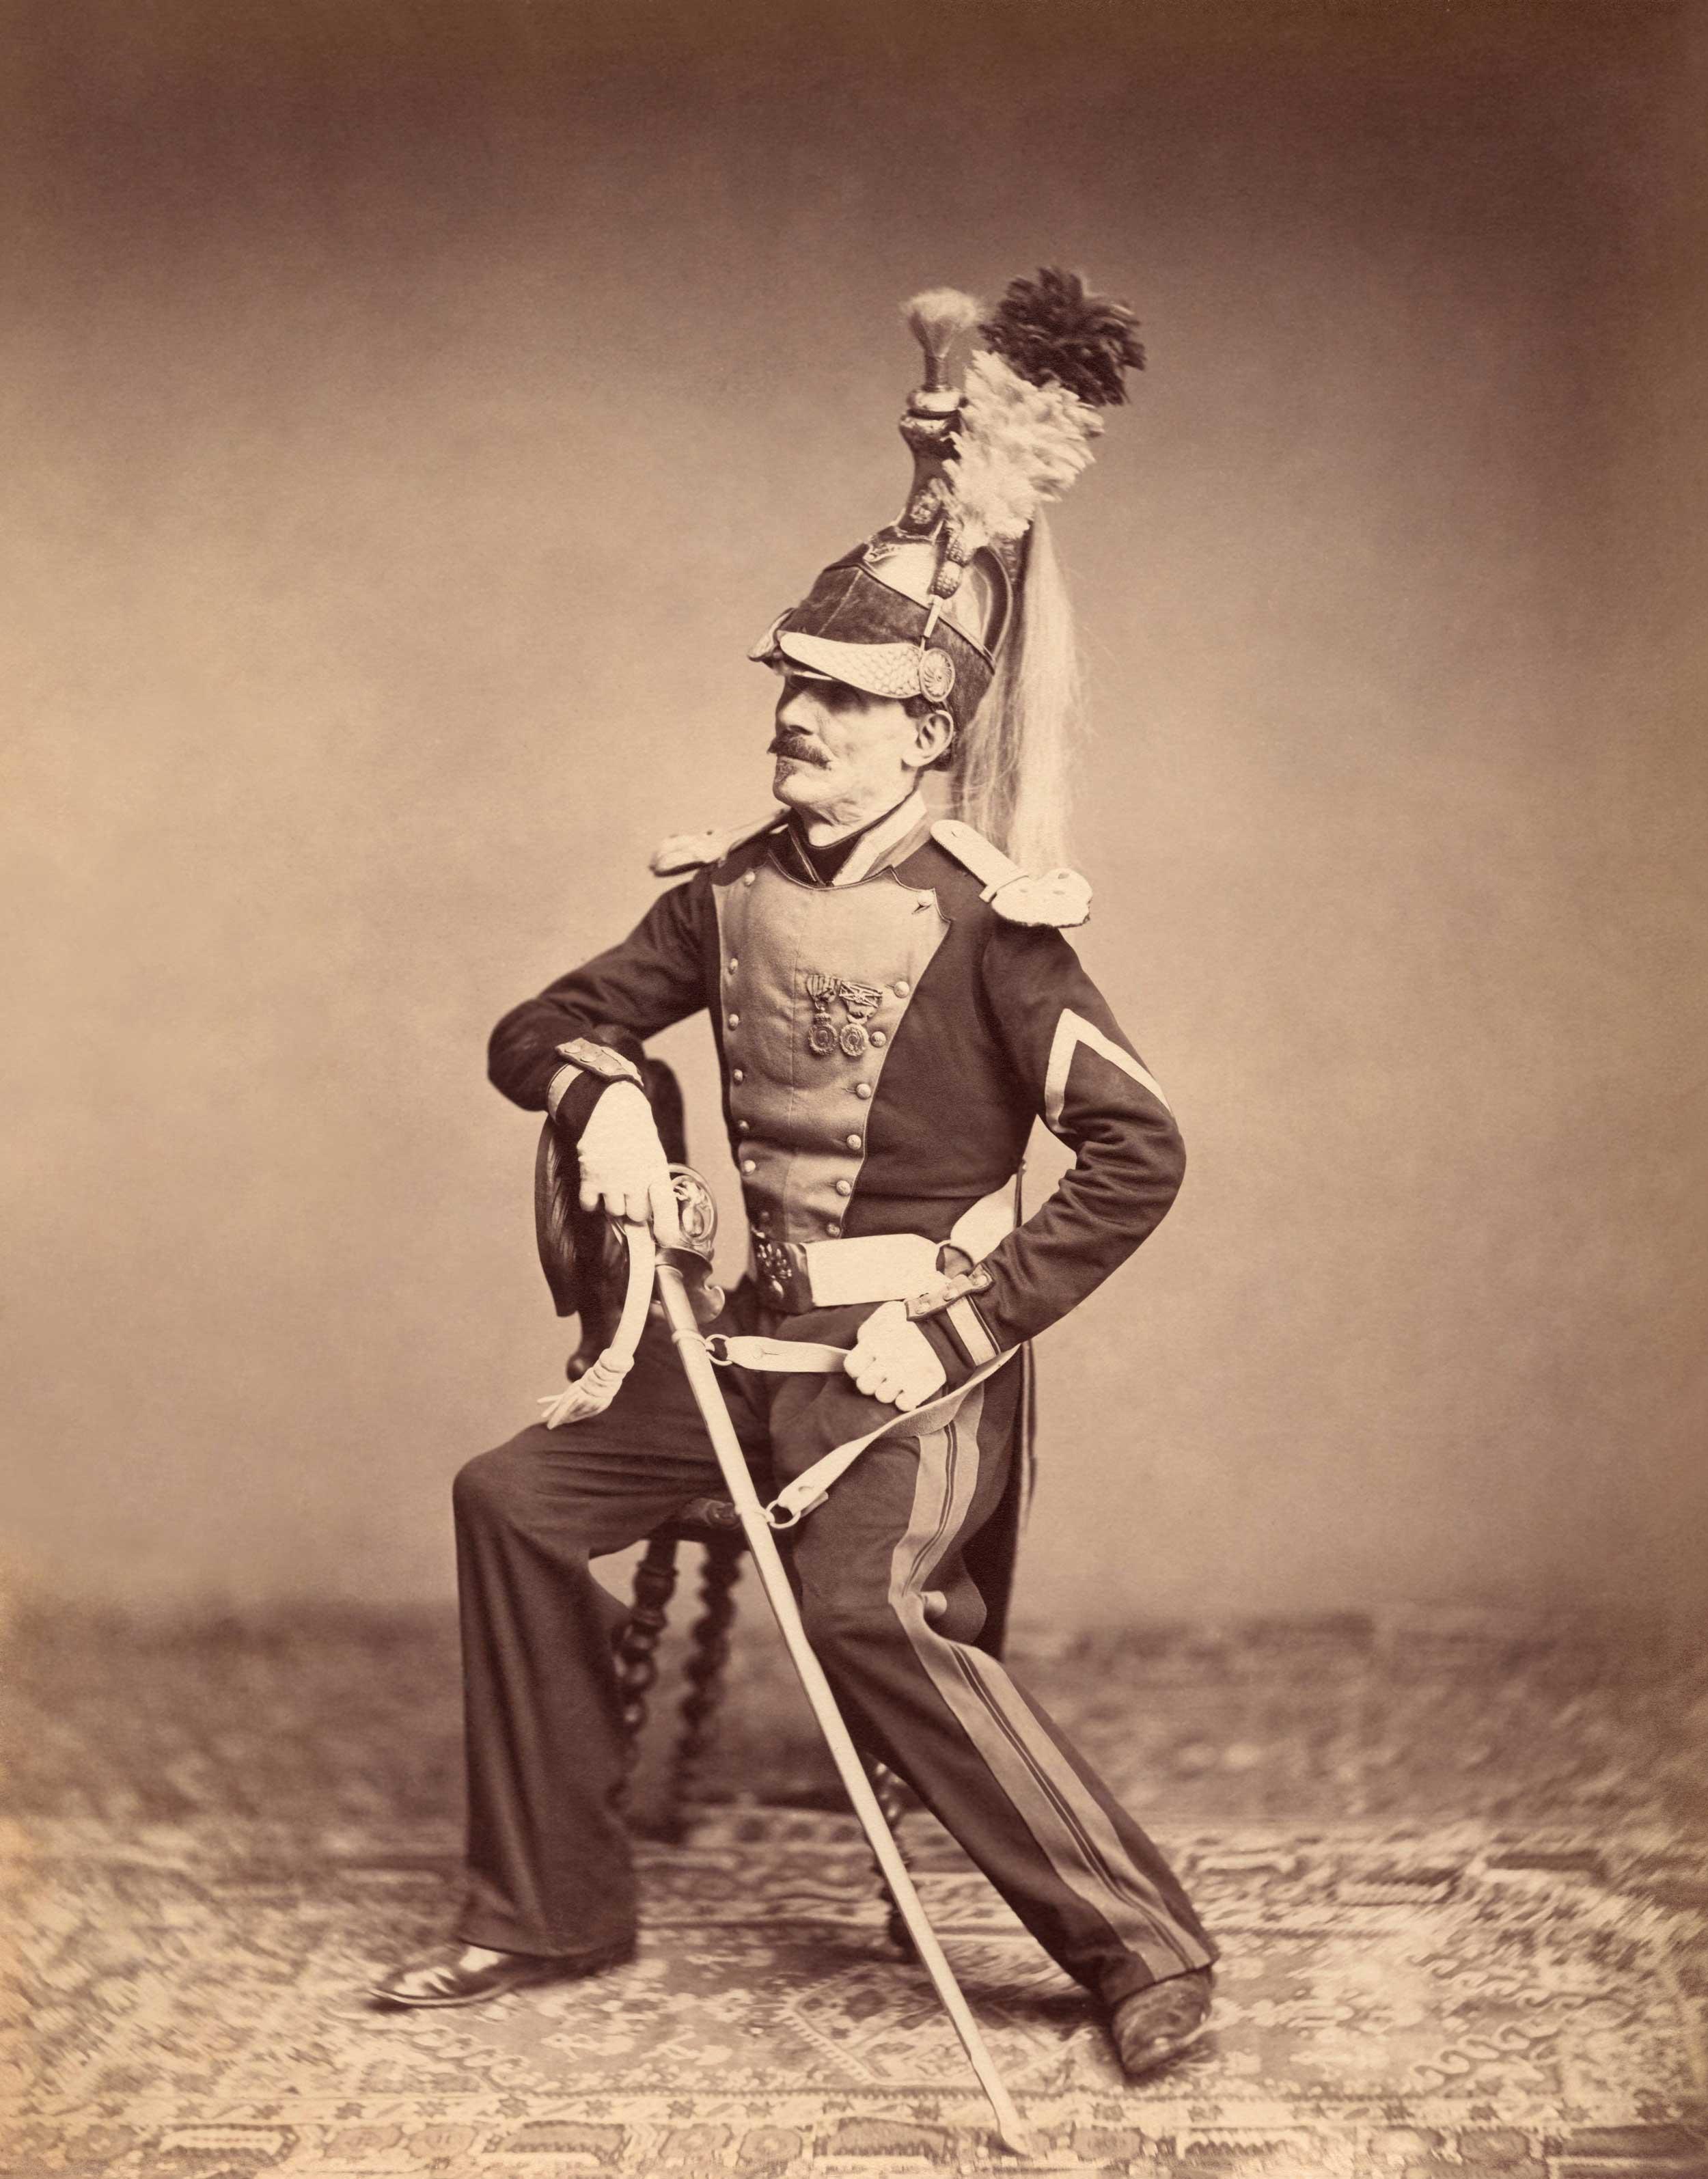 Monsieur Mauban, 8th Dragoon Regiment, 1815